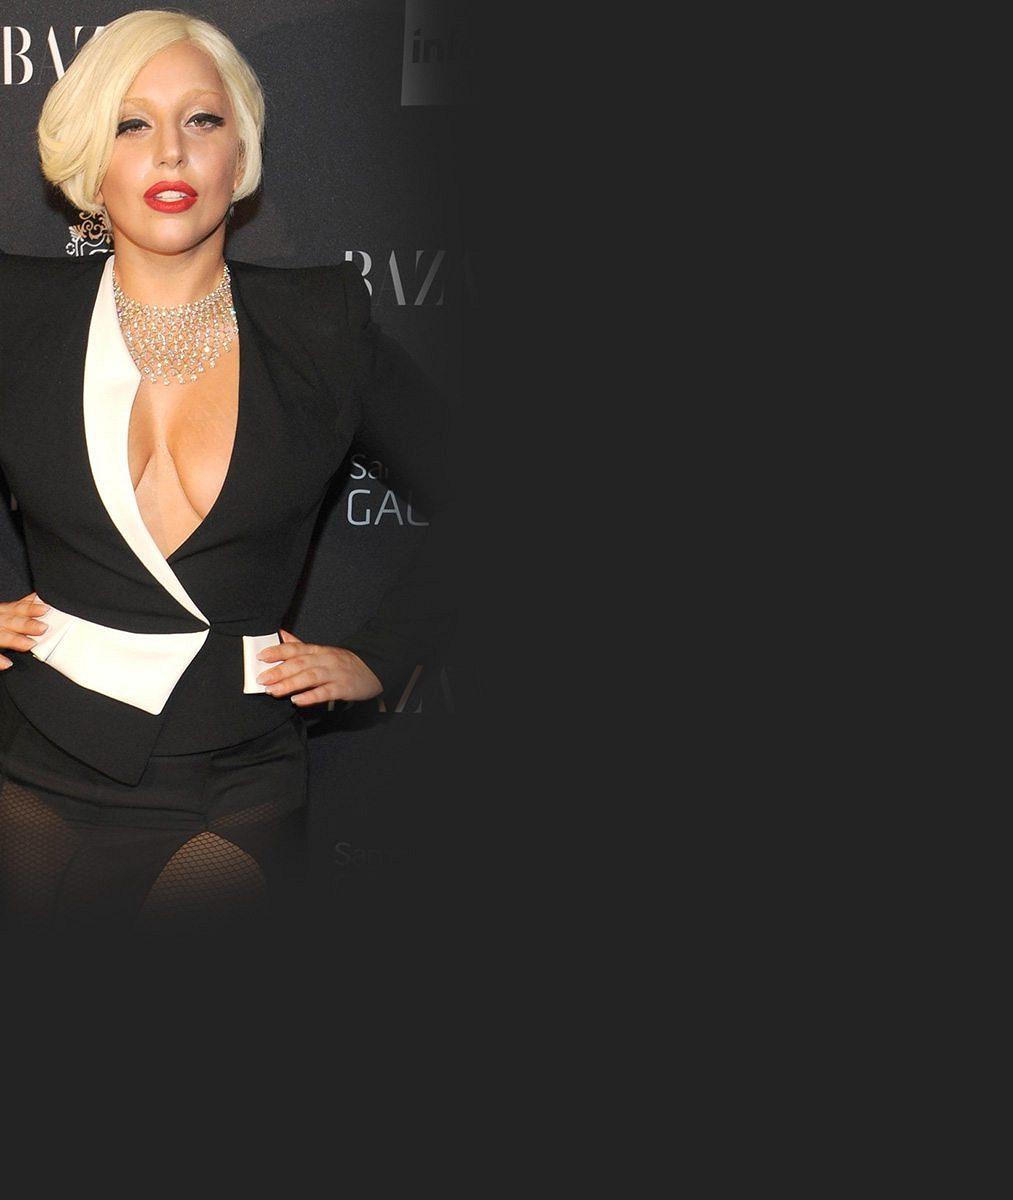 Bílá krajka neskryla zhola nic: Lady Gaga ukázala v průhledném outfitu ňadra